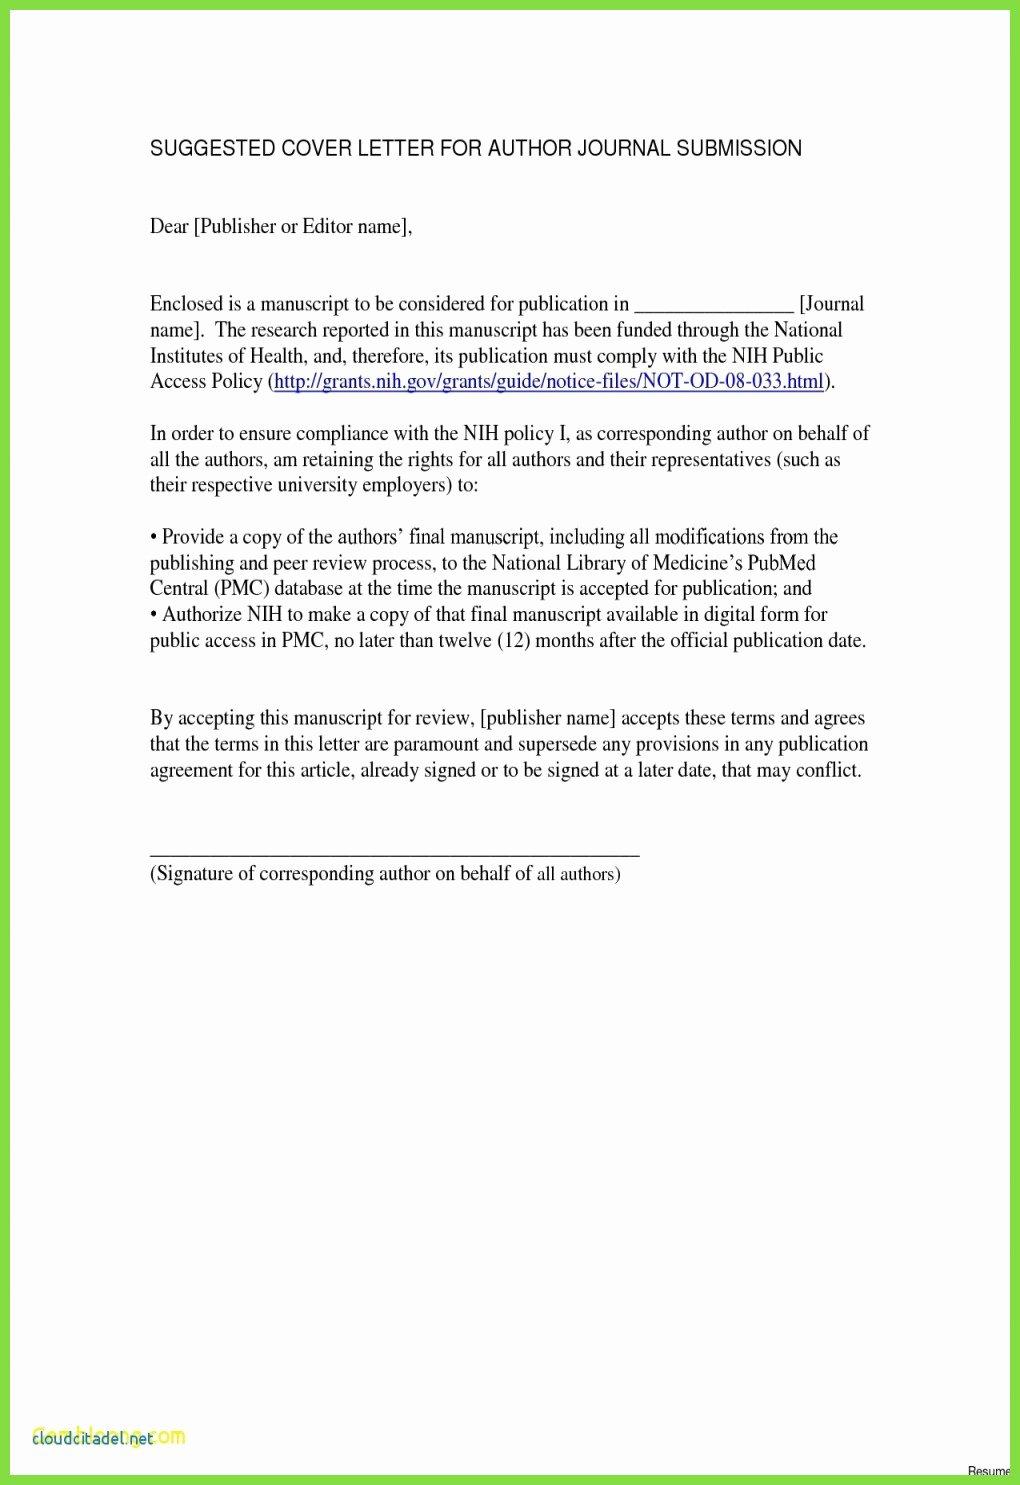 Peer Recommendation Letter Example Elegant 16 Inspirational Letter Re Mendation Peer Saowen – Letter